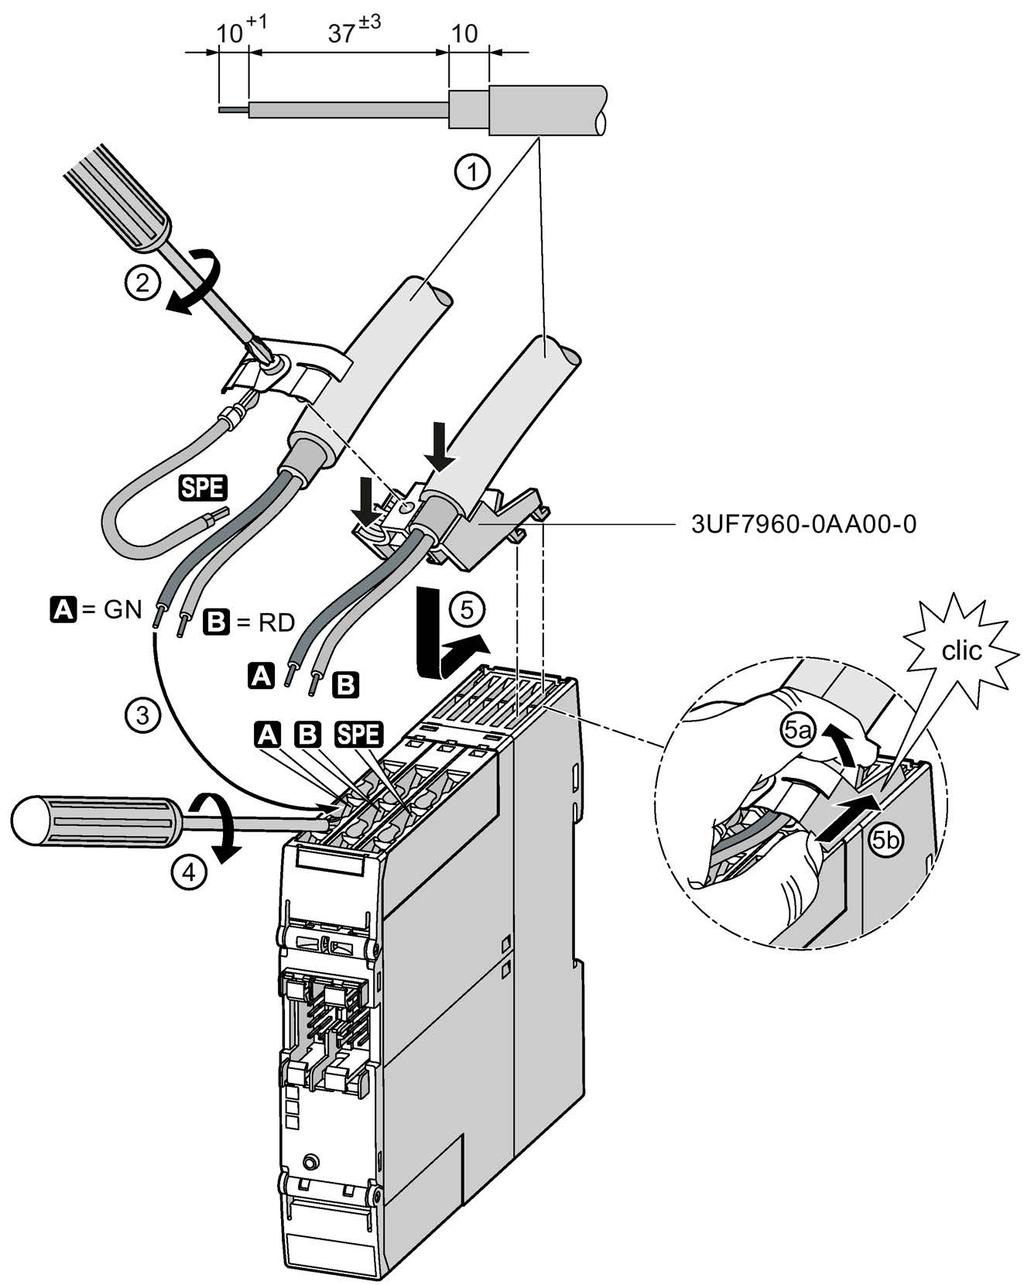 Astonishing pao machine wiring diagram ideas best image schematics